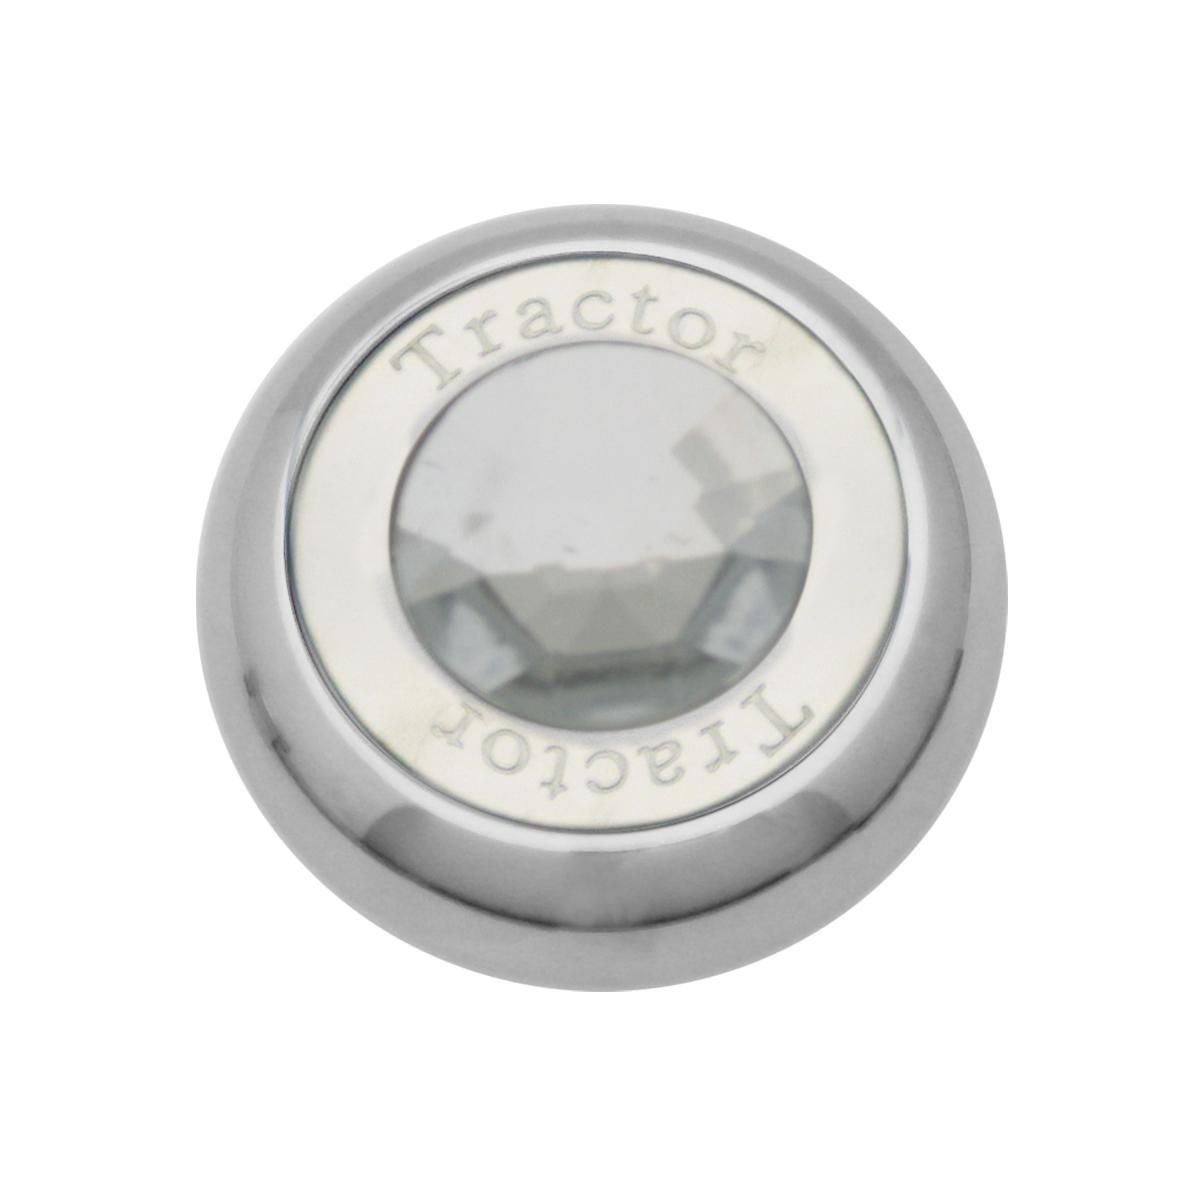 95372 Chrome Screw-In Air Valve Control Knob w/ Crystal